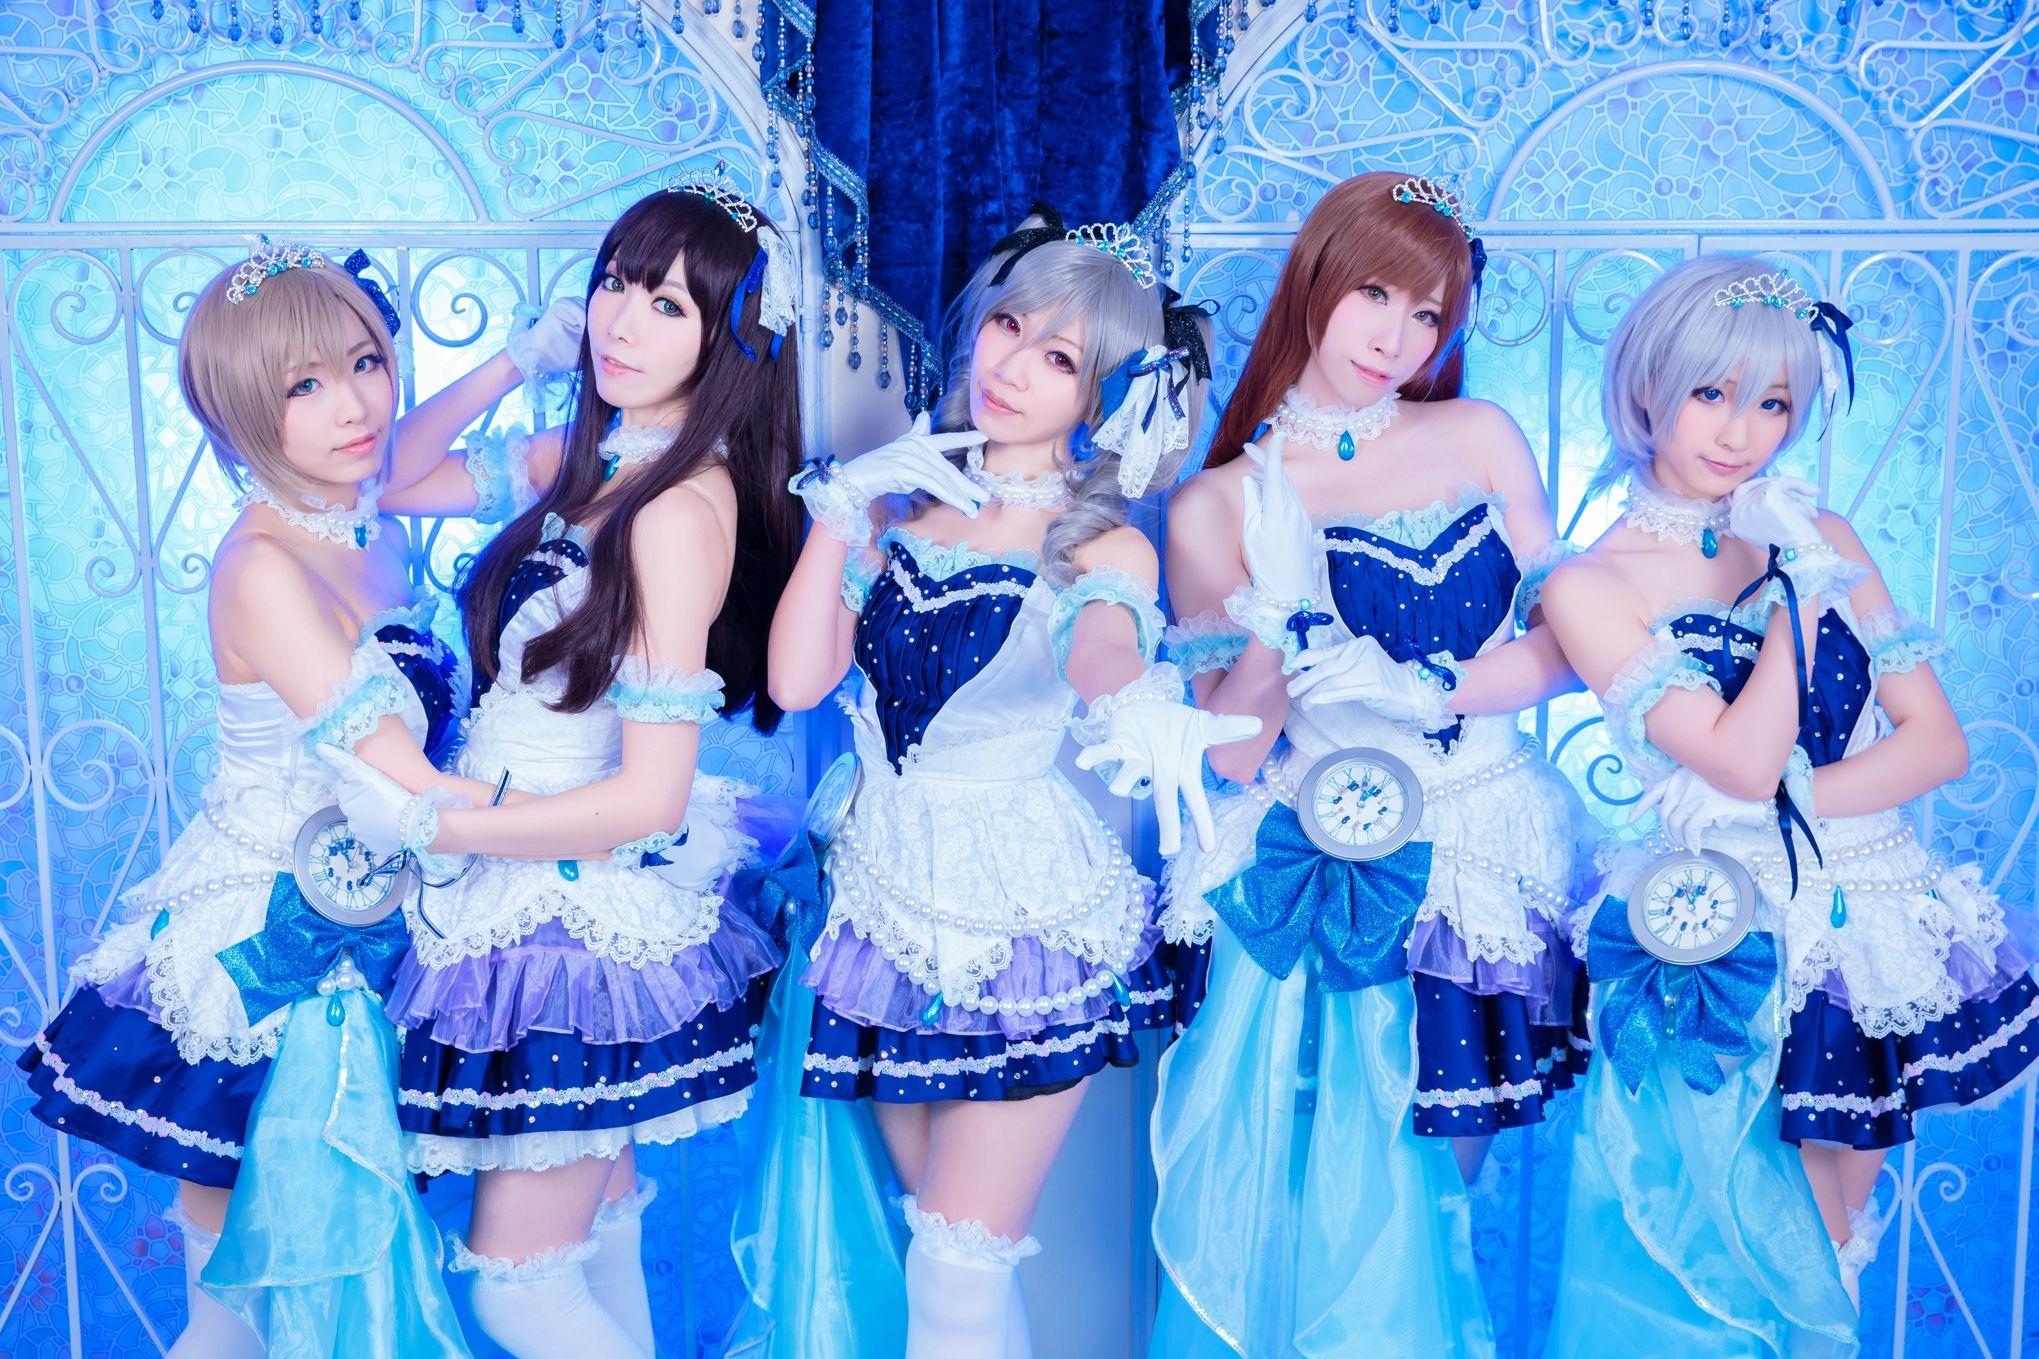 AMPLE - Hitsuki/冰月 - アイドルマスター シンデレラガールズ[THE IDOLM@STER CINDERELLA GIRLS ]